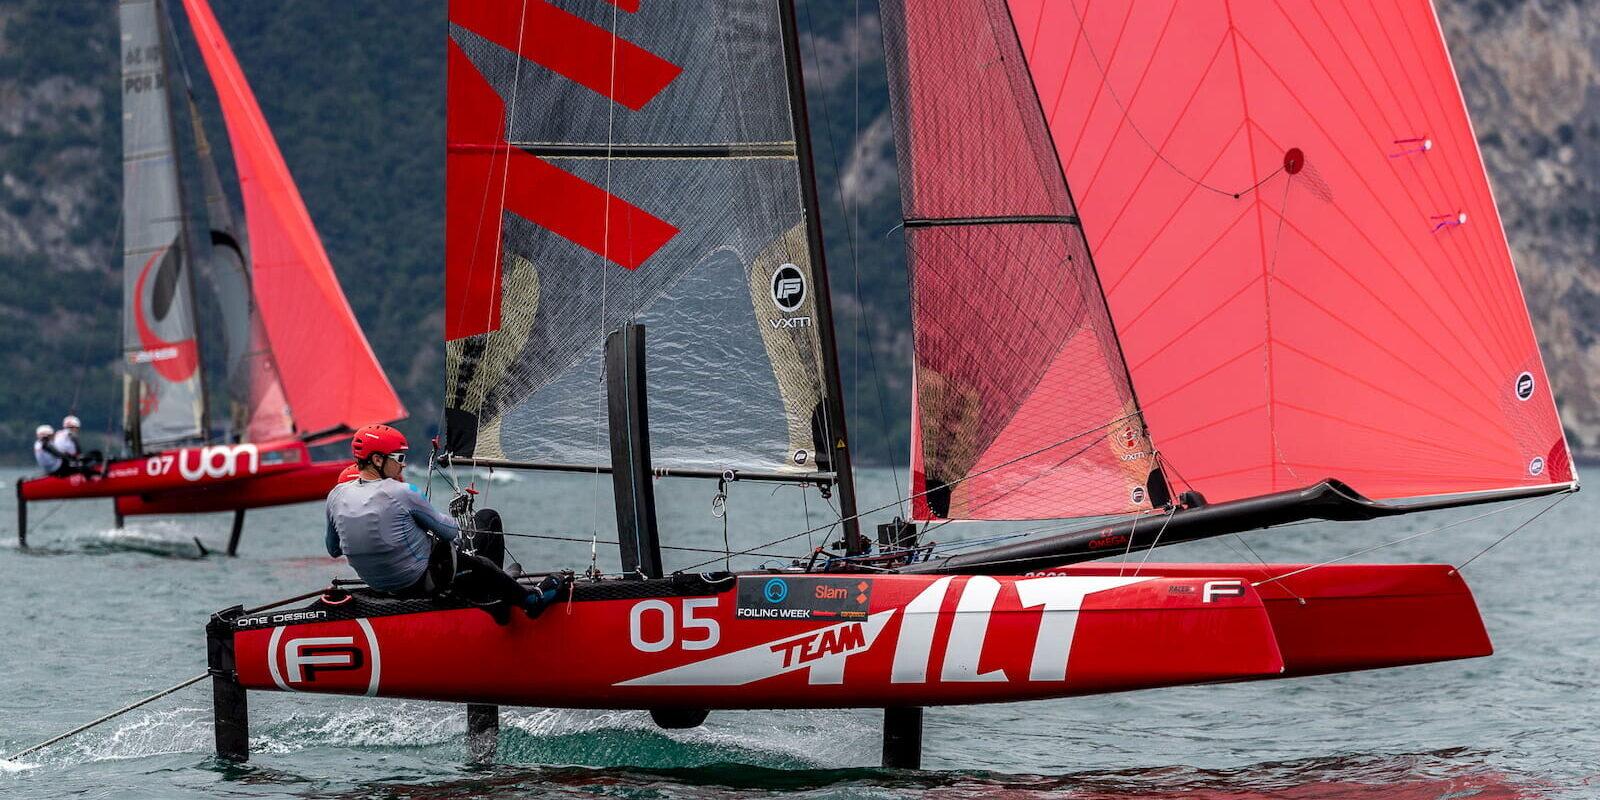 Catamarano Foiling Week 2019 Fraglia Vela Malcesine